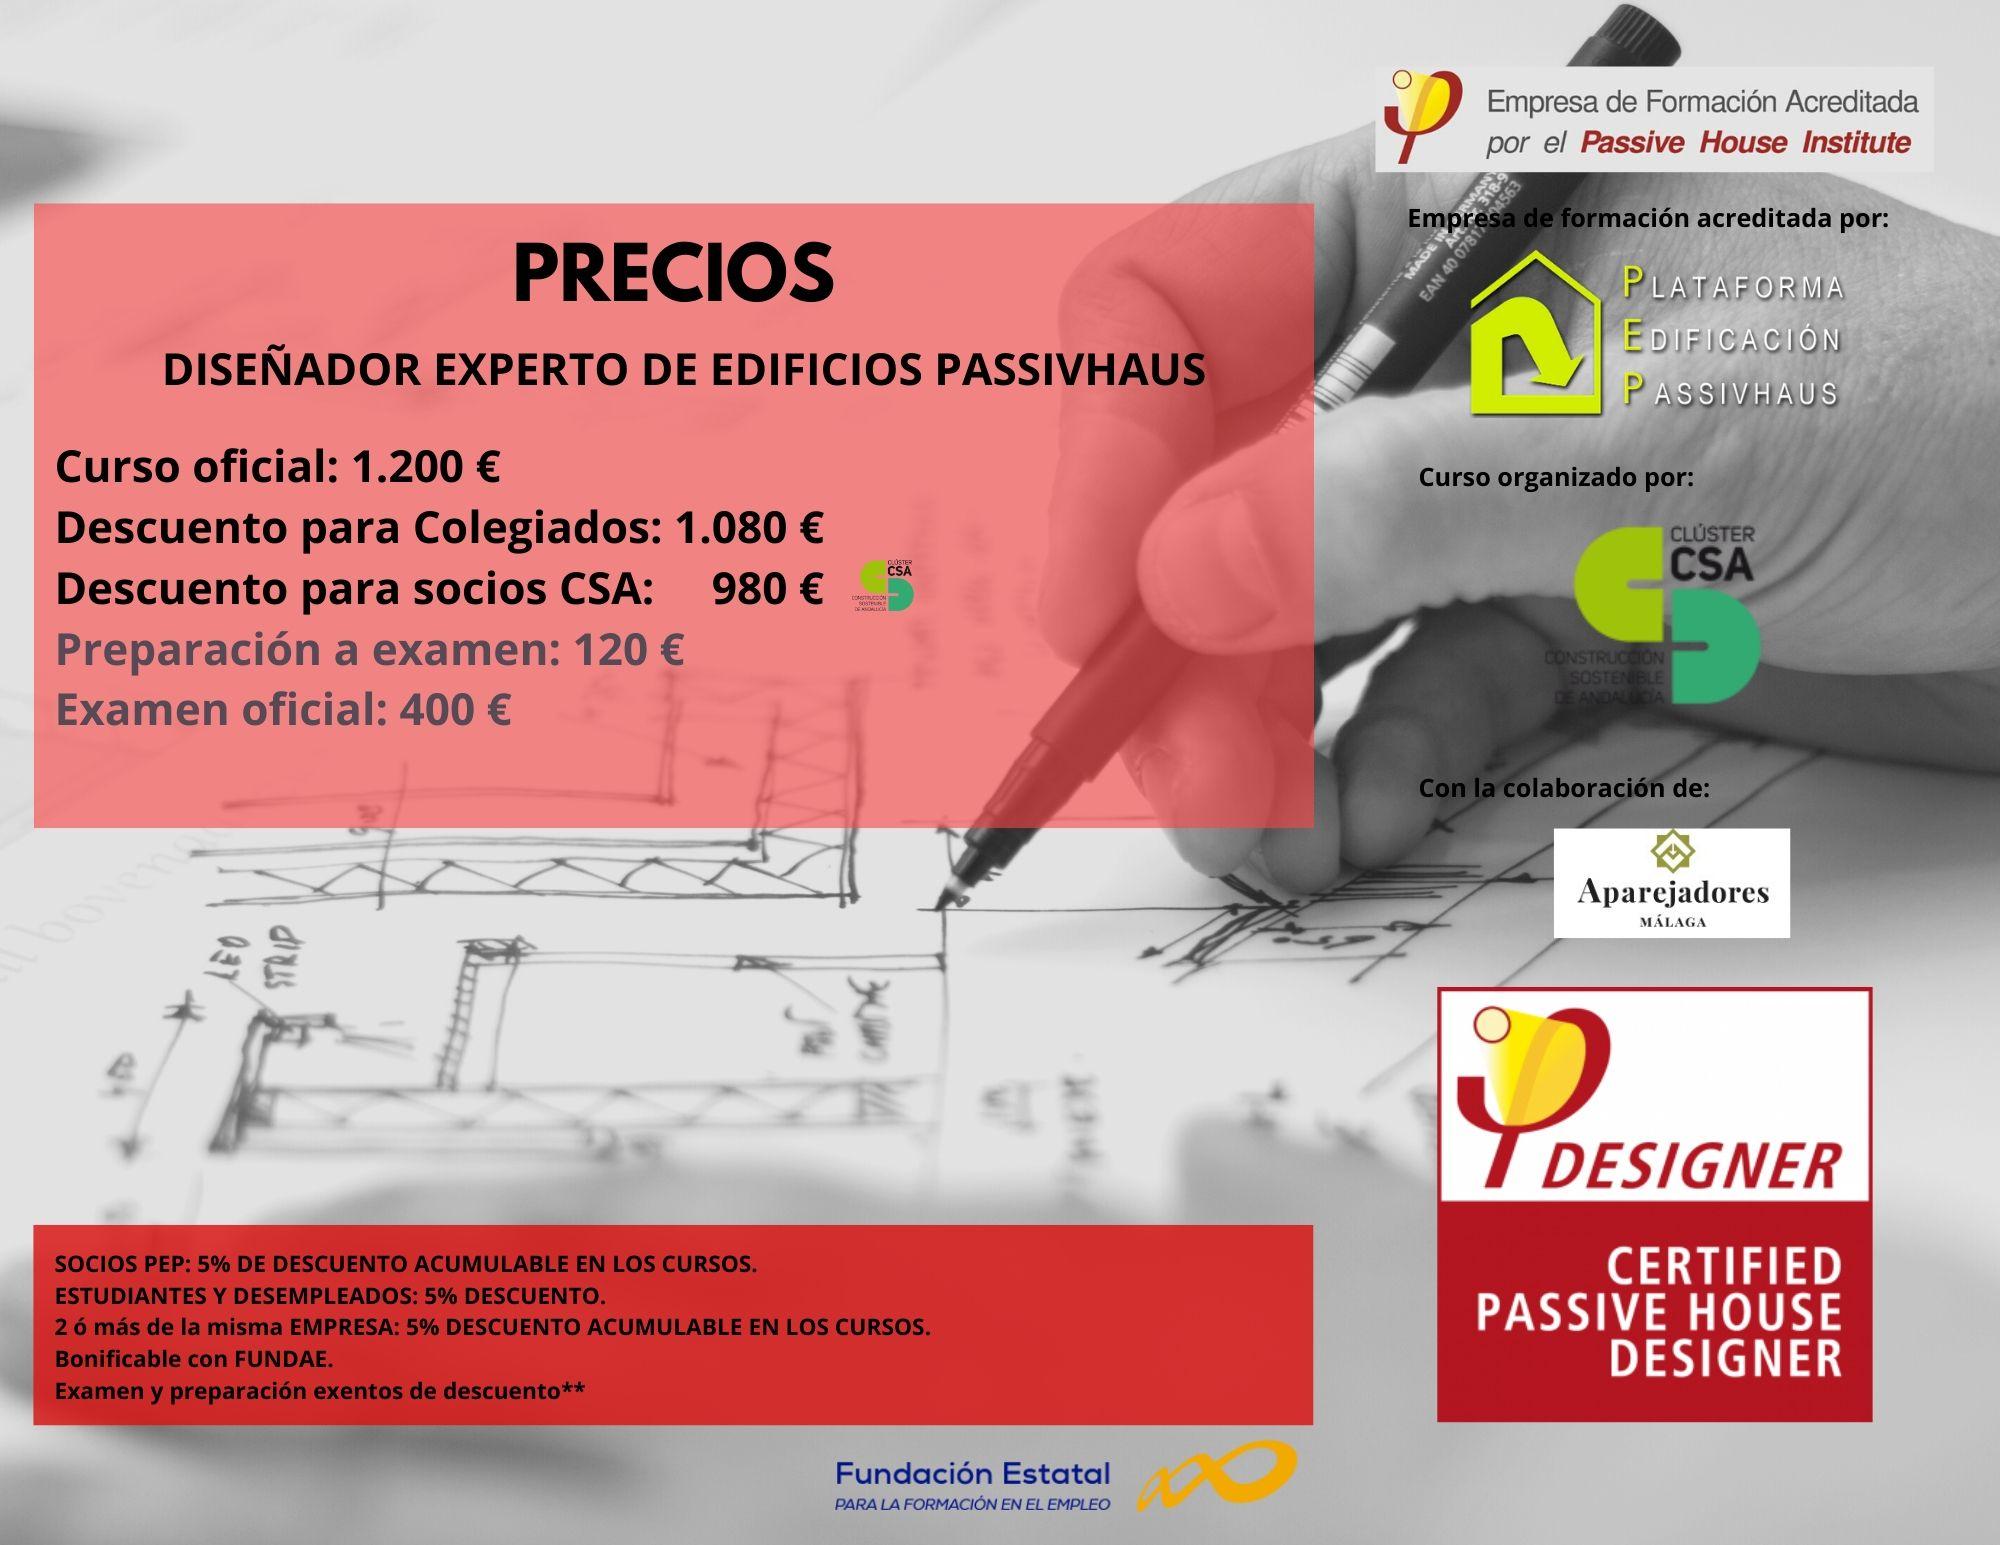 Curso Passivhaus Designer C&A Precios